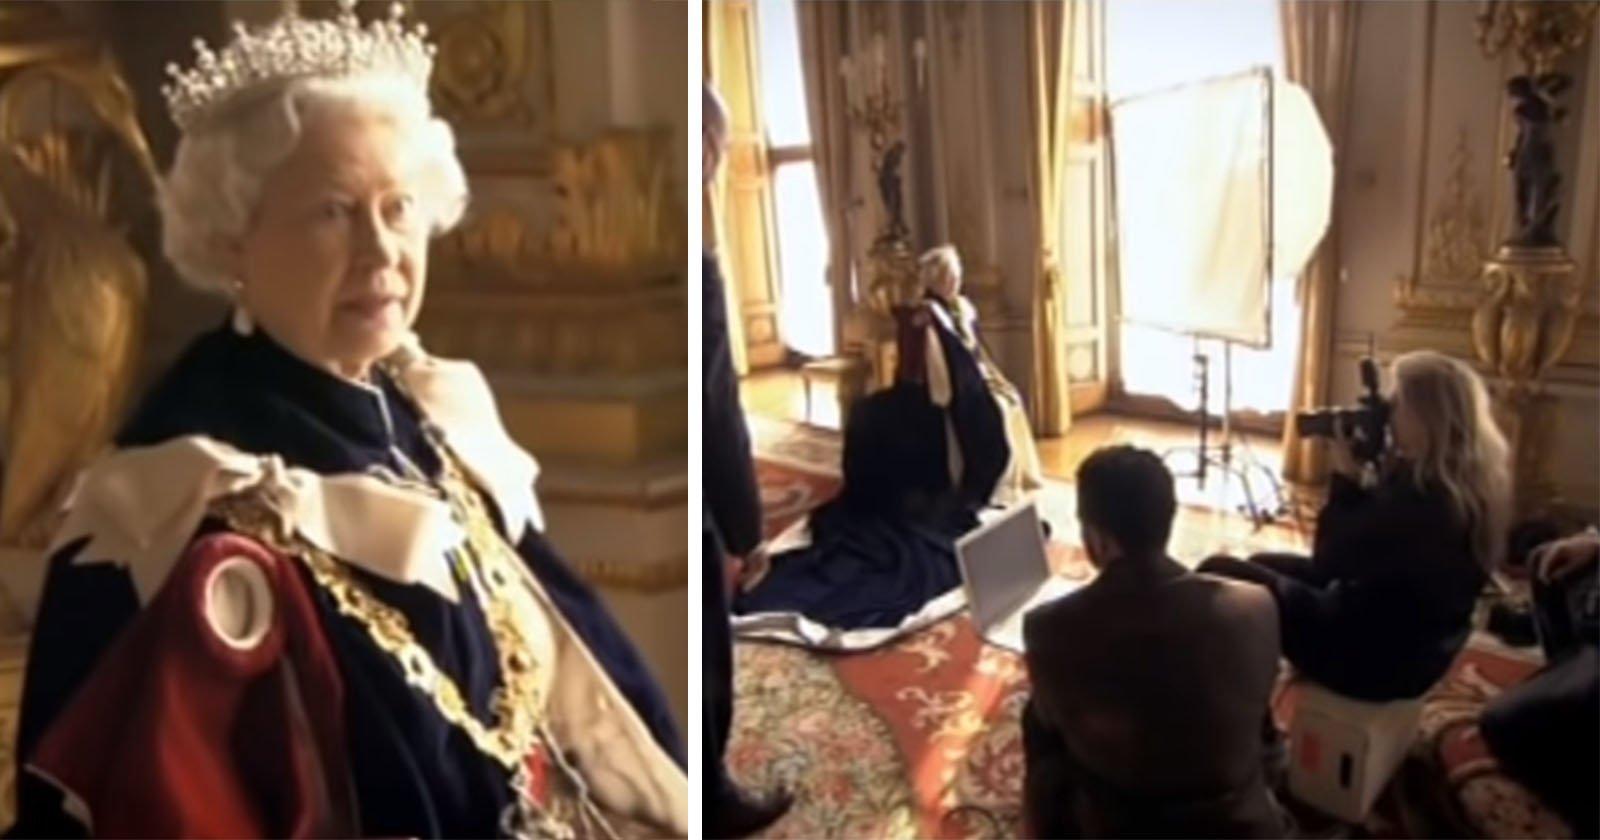 Watch Annie Leibovitz Get Scolded by Queen Elizabeth During a Photo Shoot